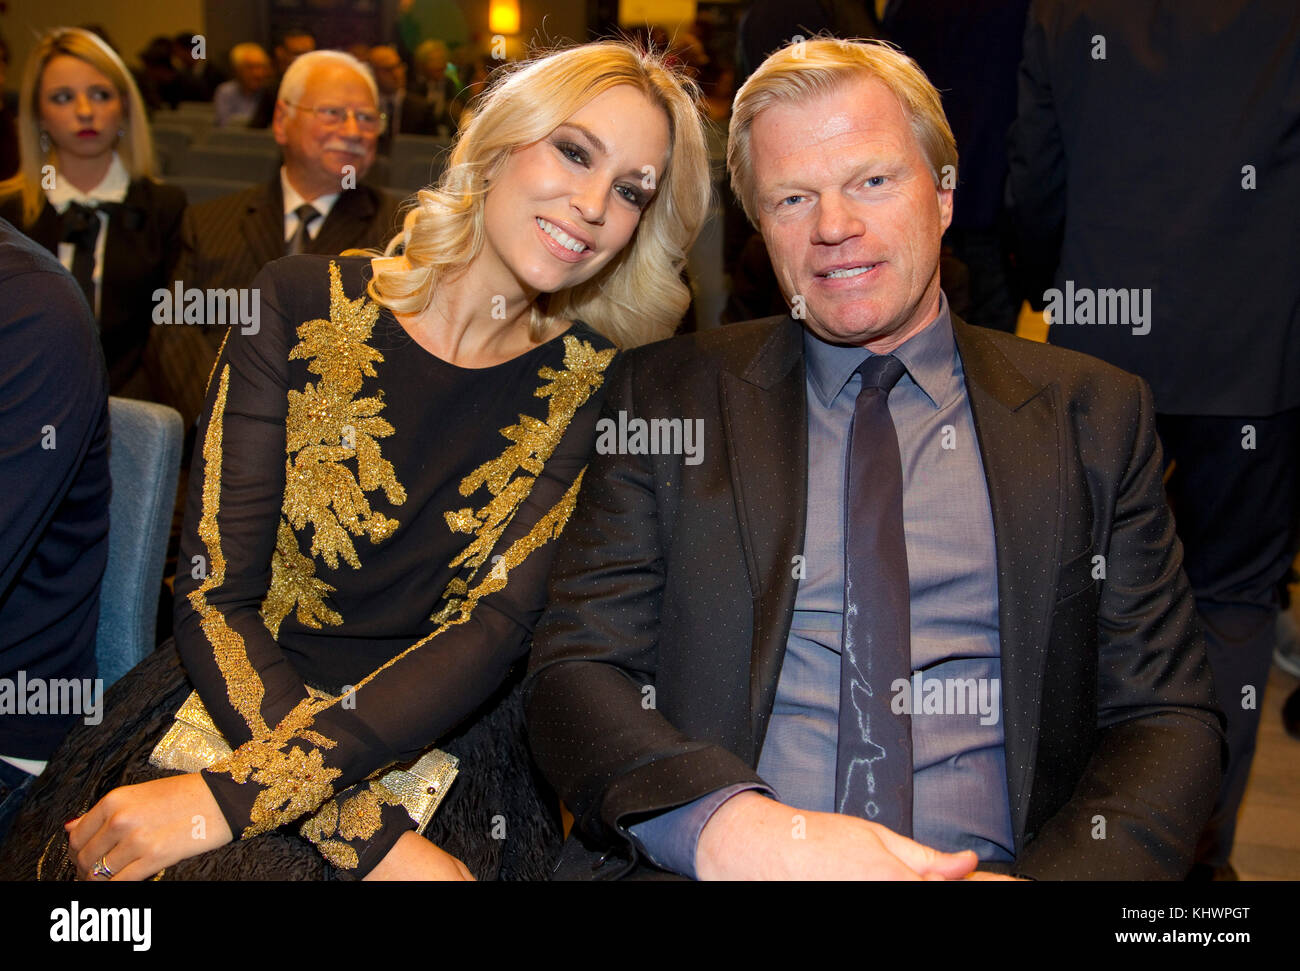 Monaco, Monte Carlo - November 07, 2017: Goldenfoot Hublot The Campions Promenade Award with Legend Award Winner - Stock Image